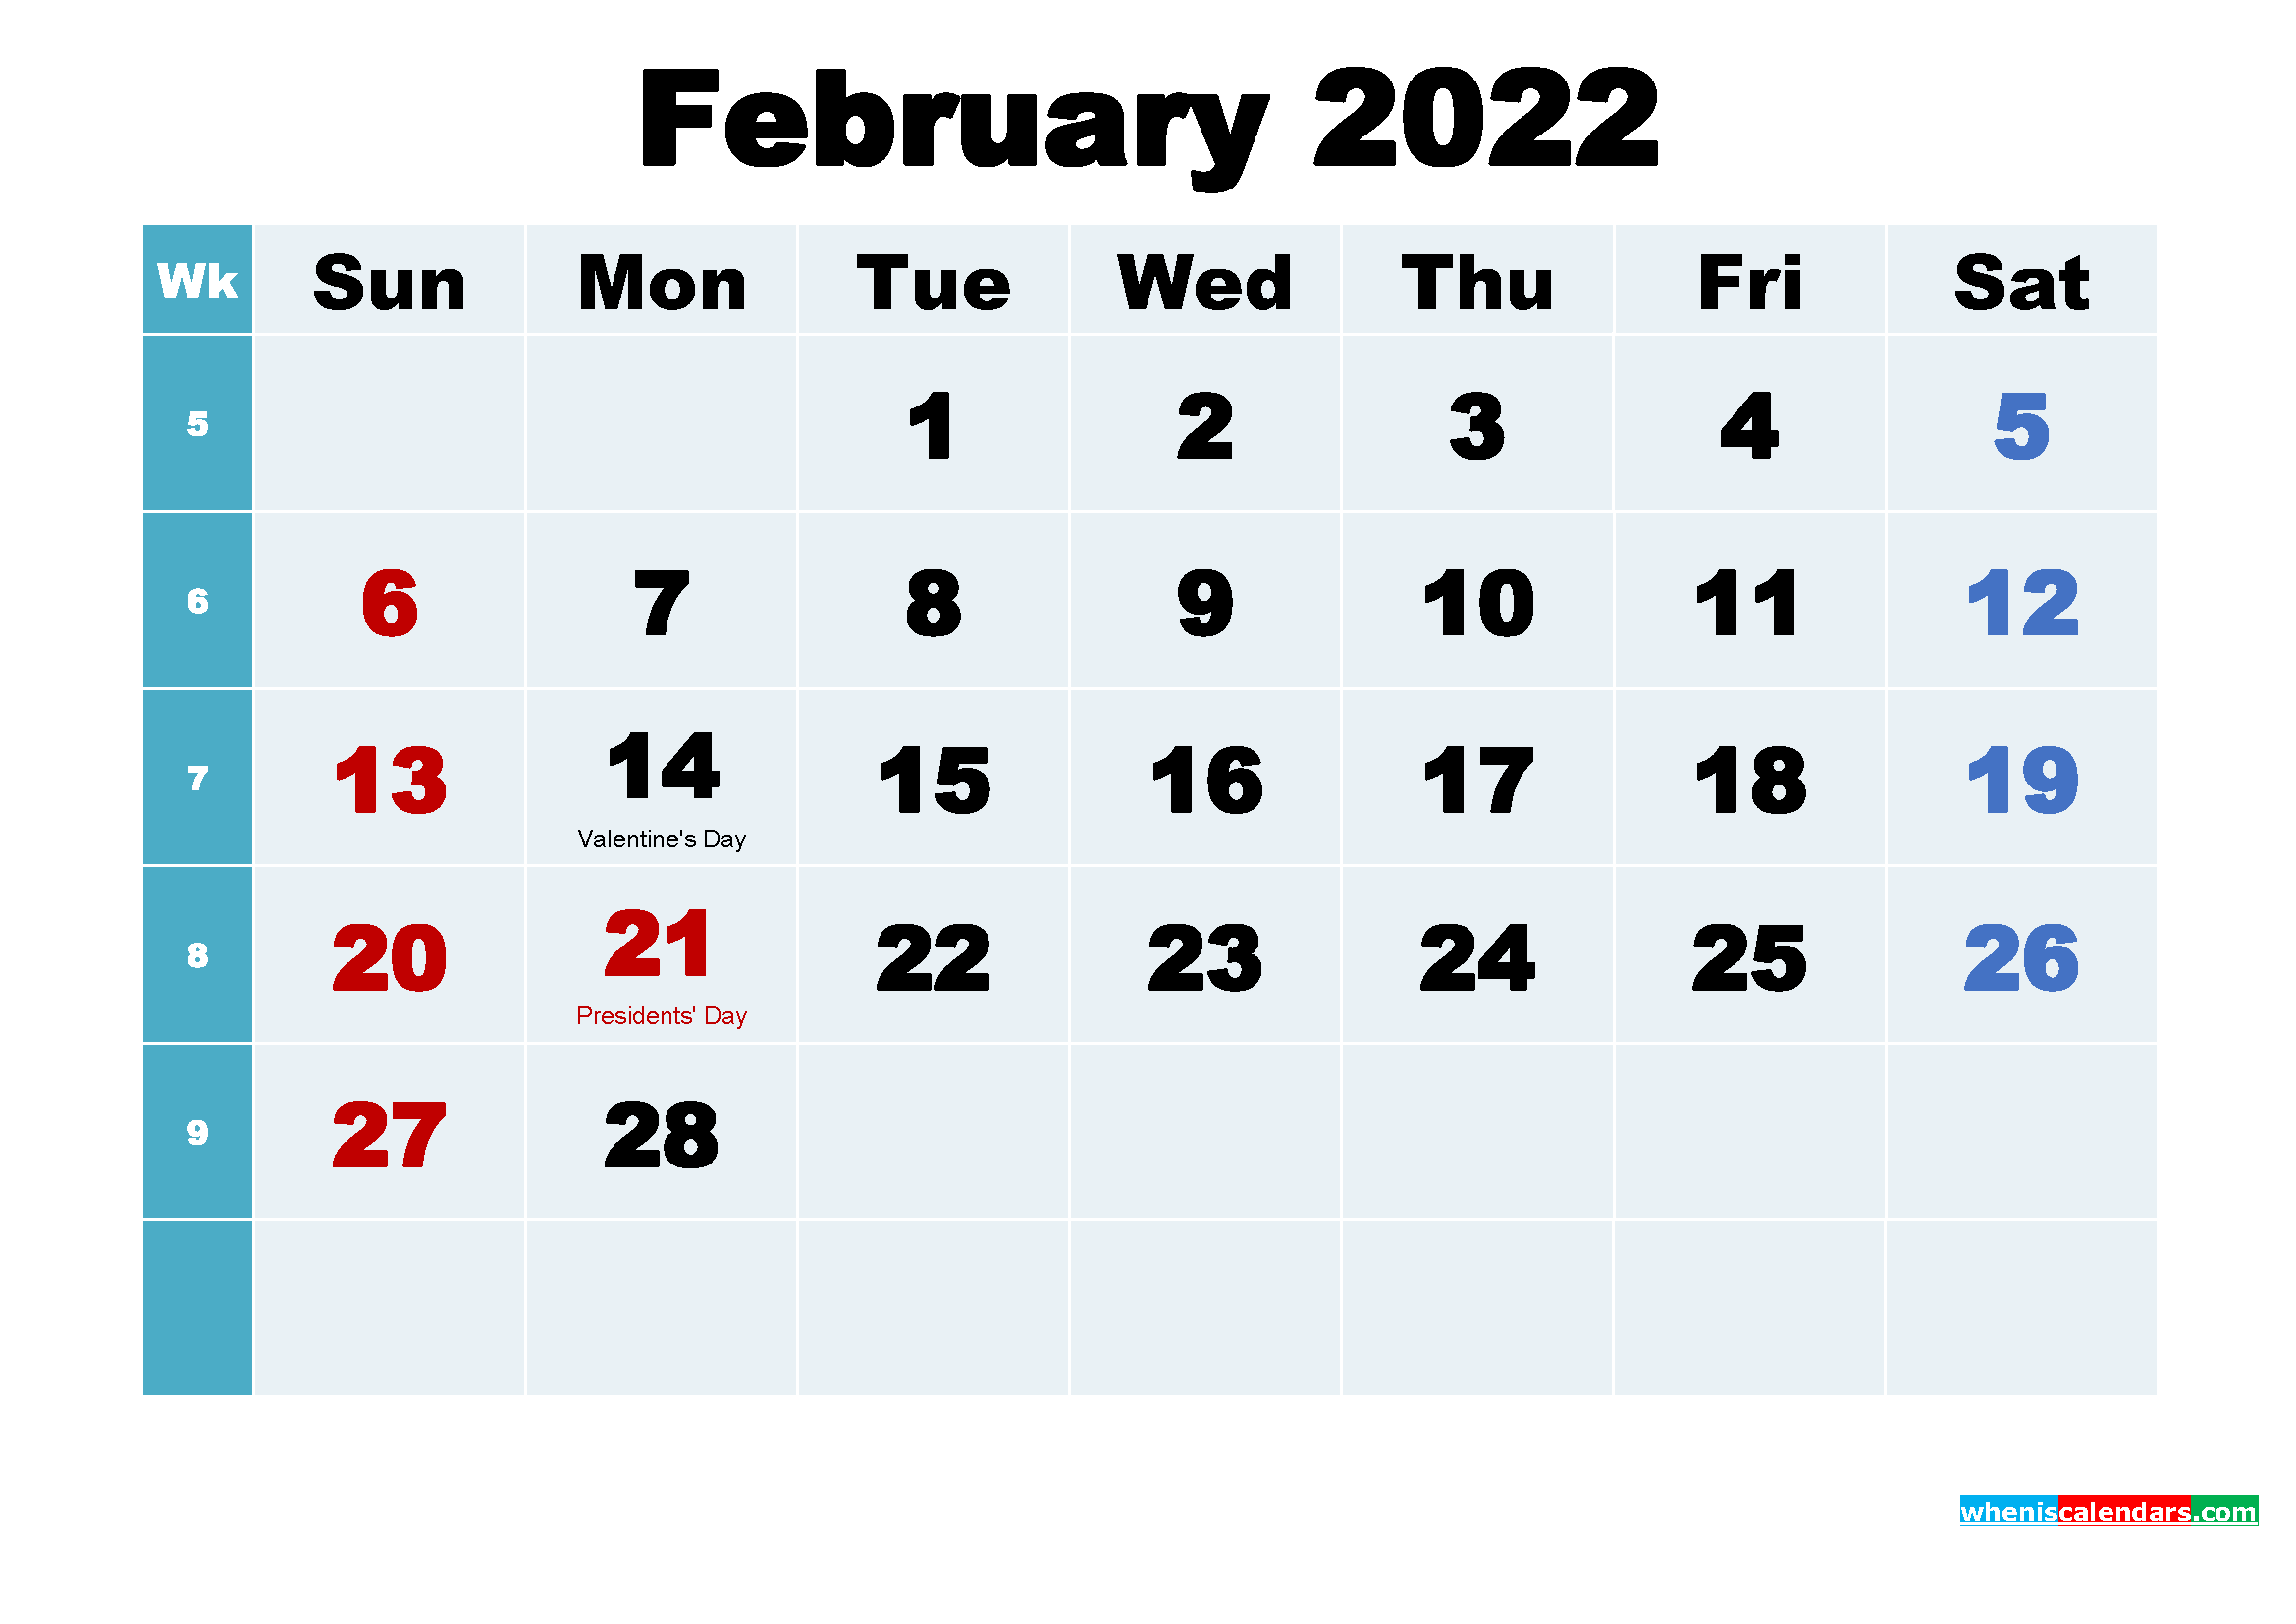 January 2022 Wallpaper Calendar.2022 Calendar Wallpapers Wallpaper Cave